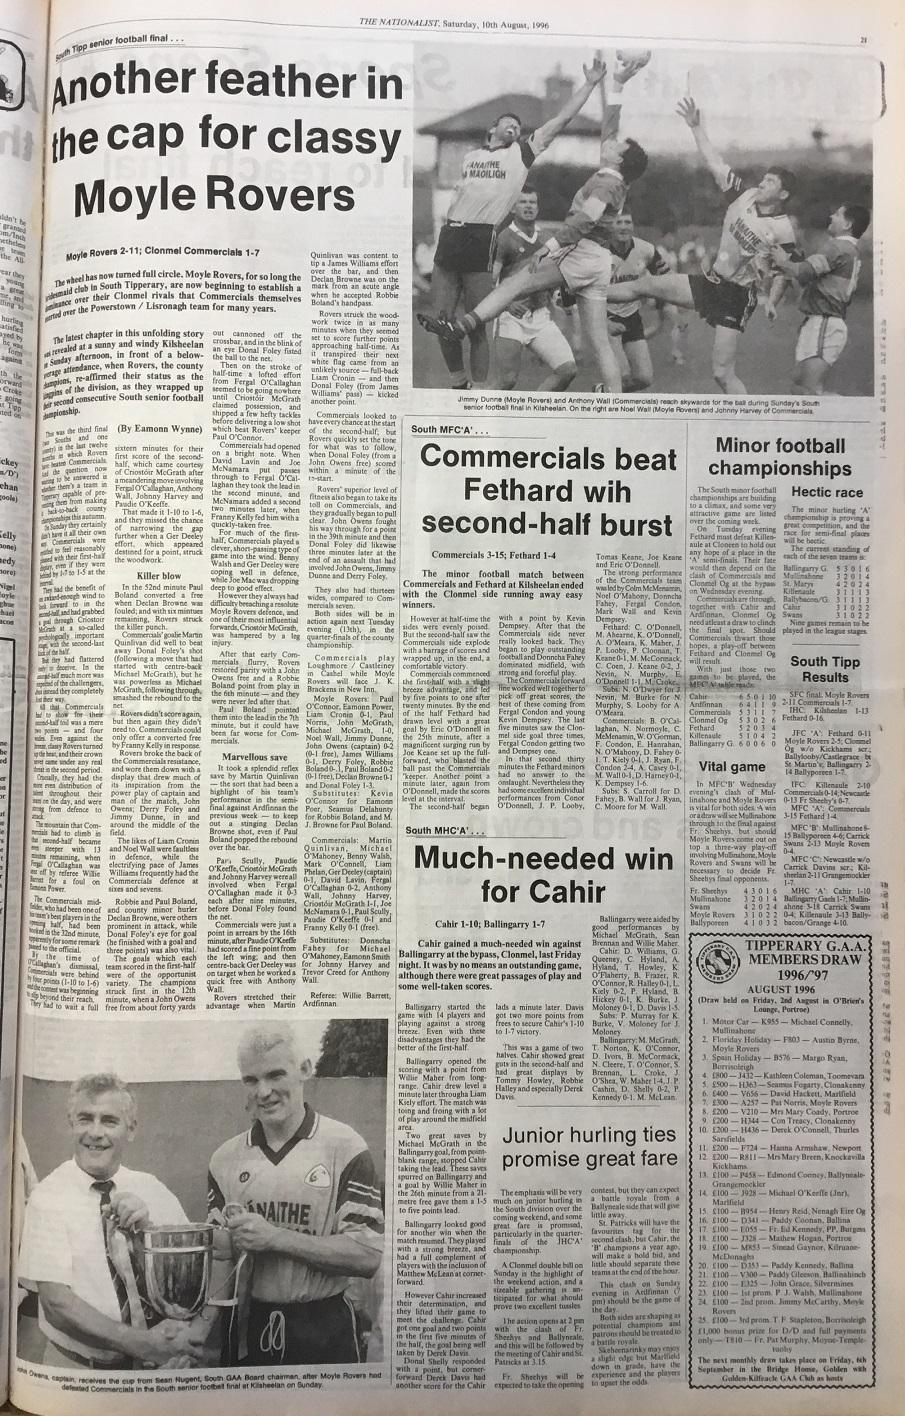 1996 South football final